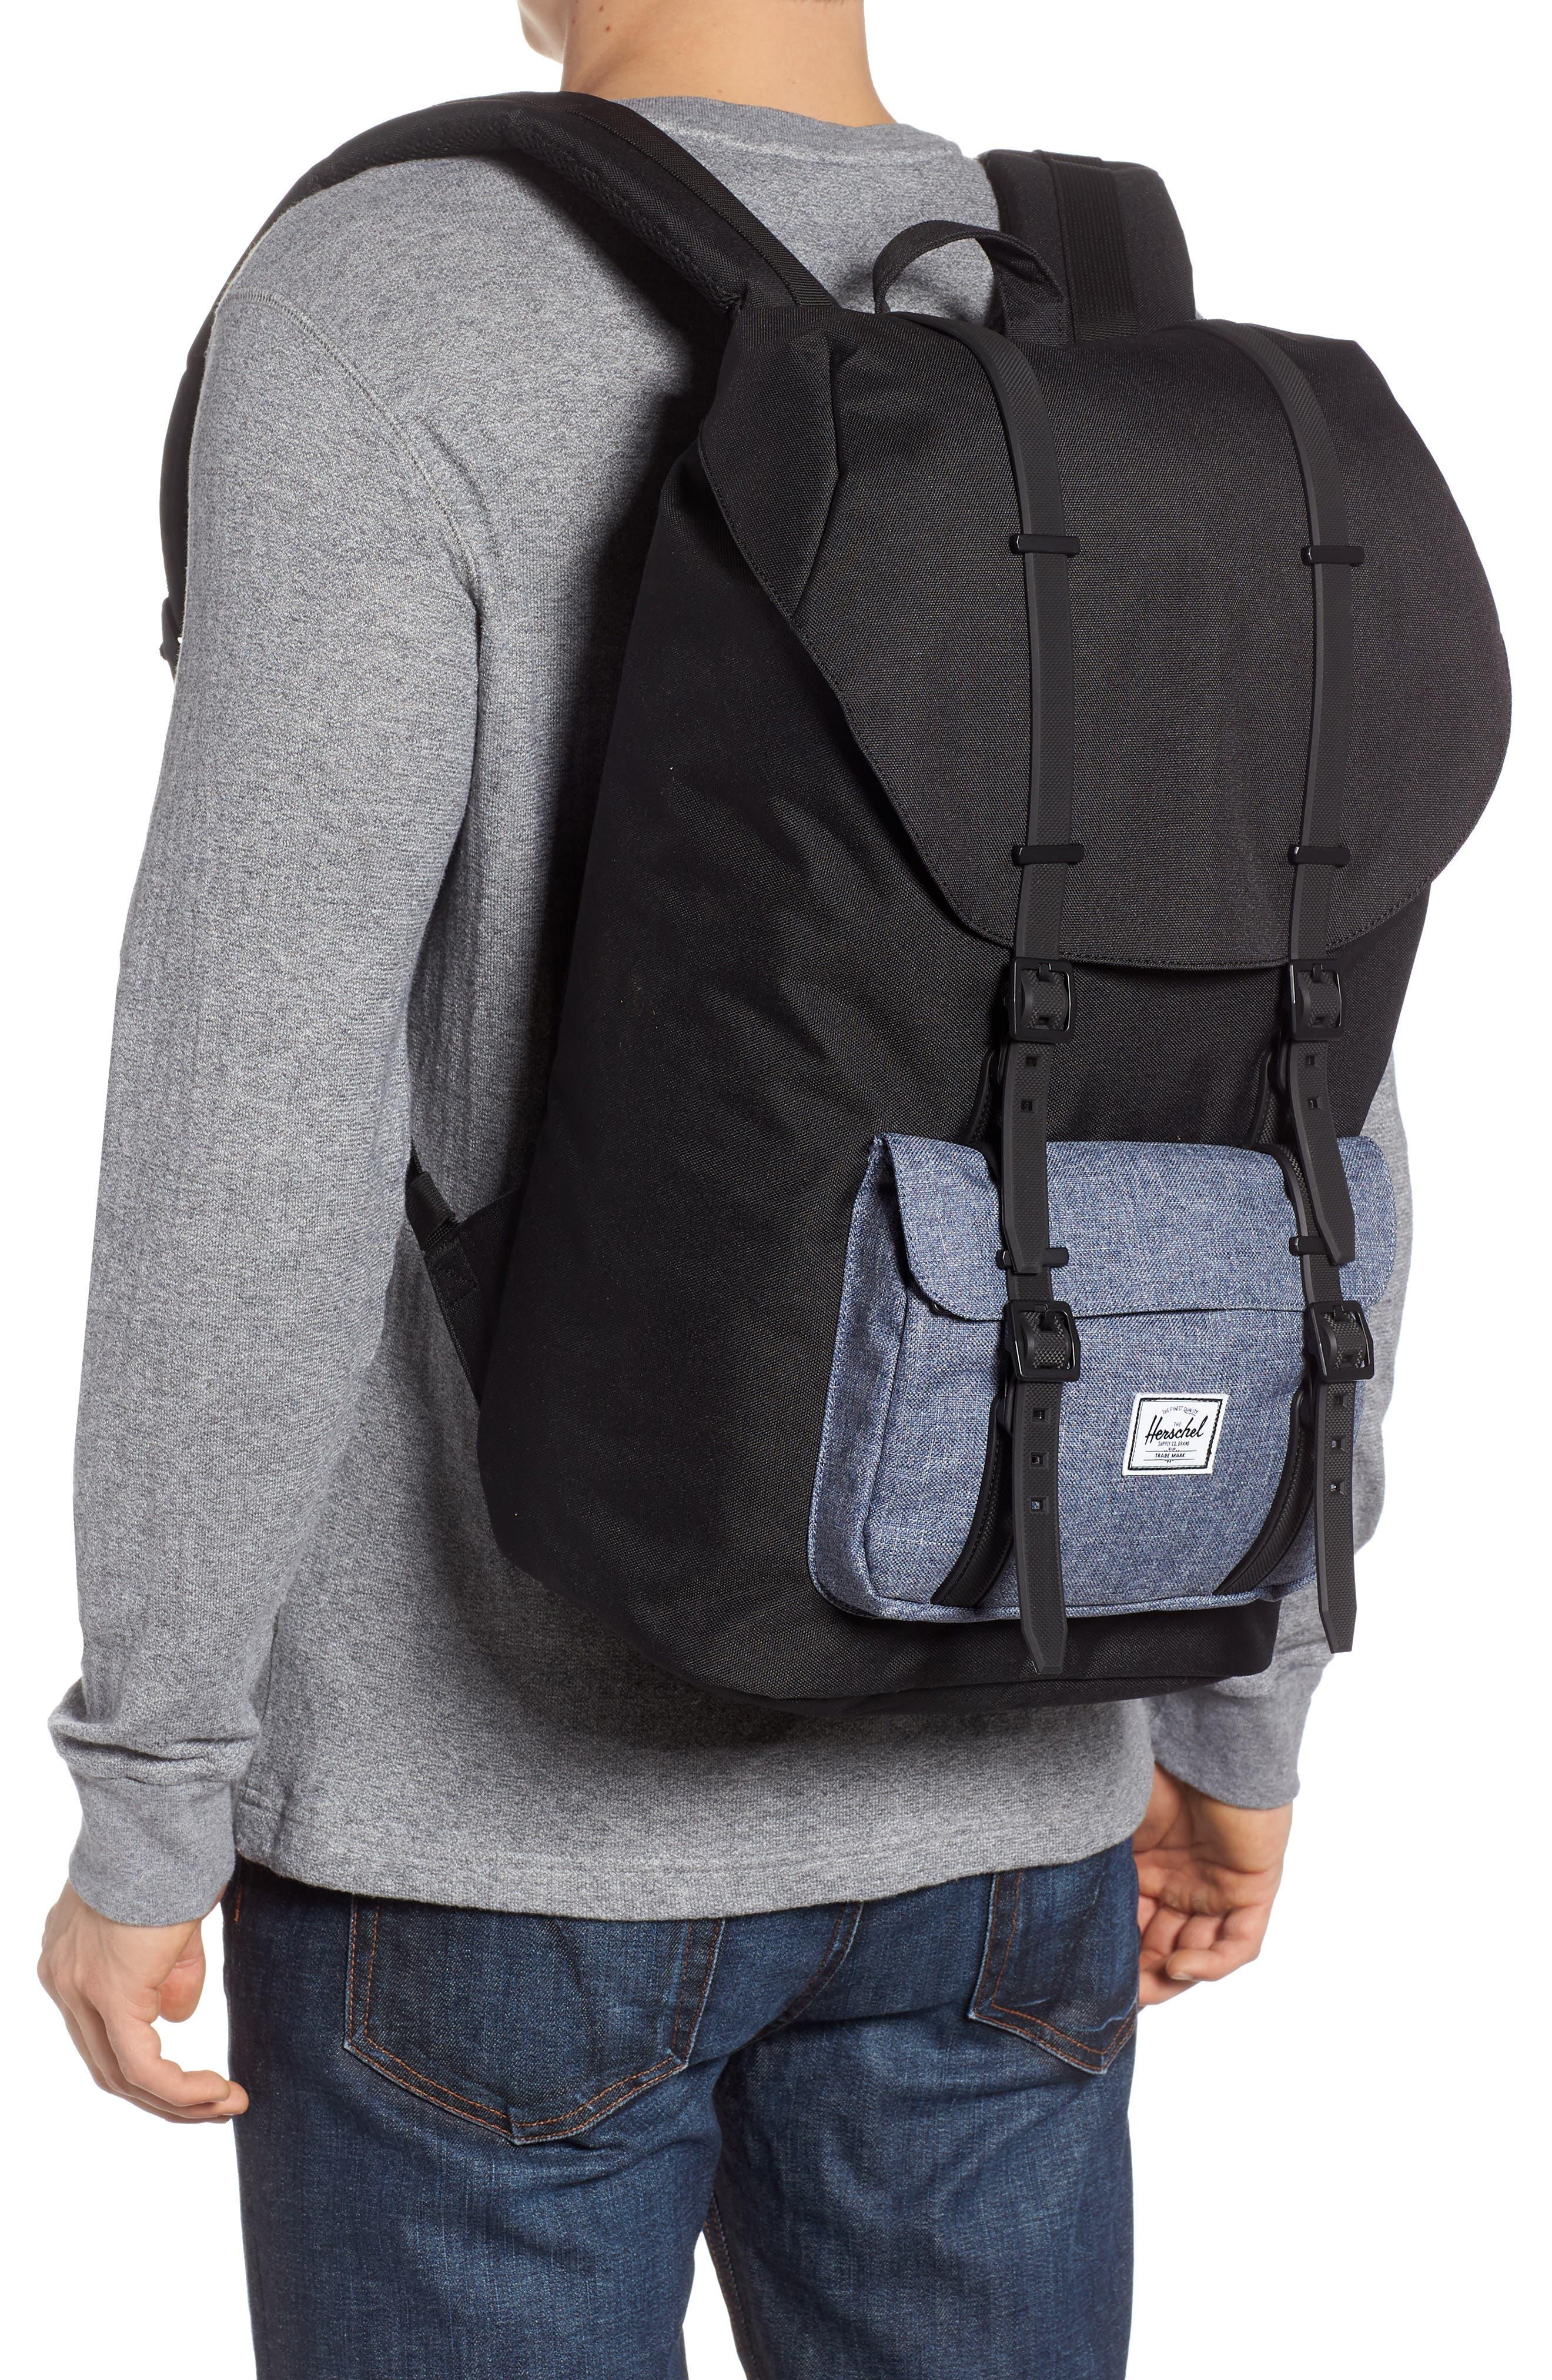 Little America - Chambray Backpack,                             Alternate thumbnail 2, color,                             Black/ Dark Chambray